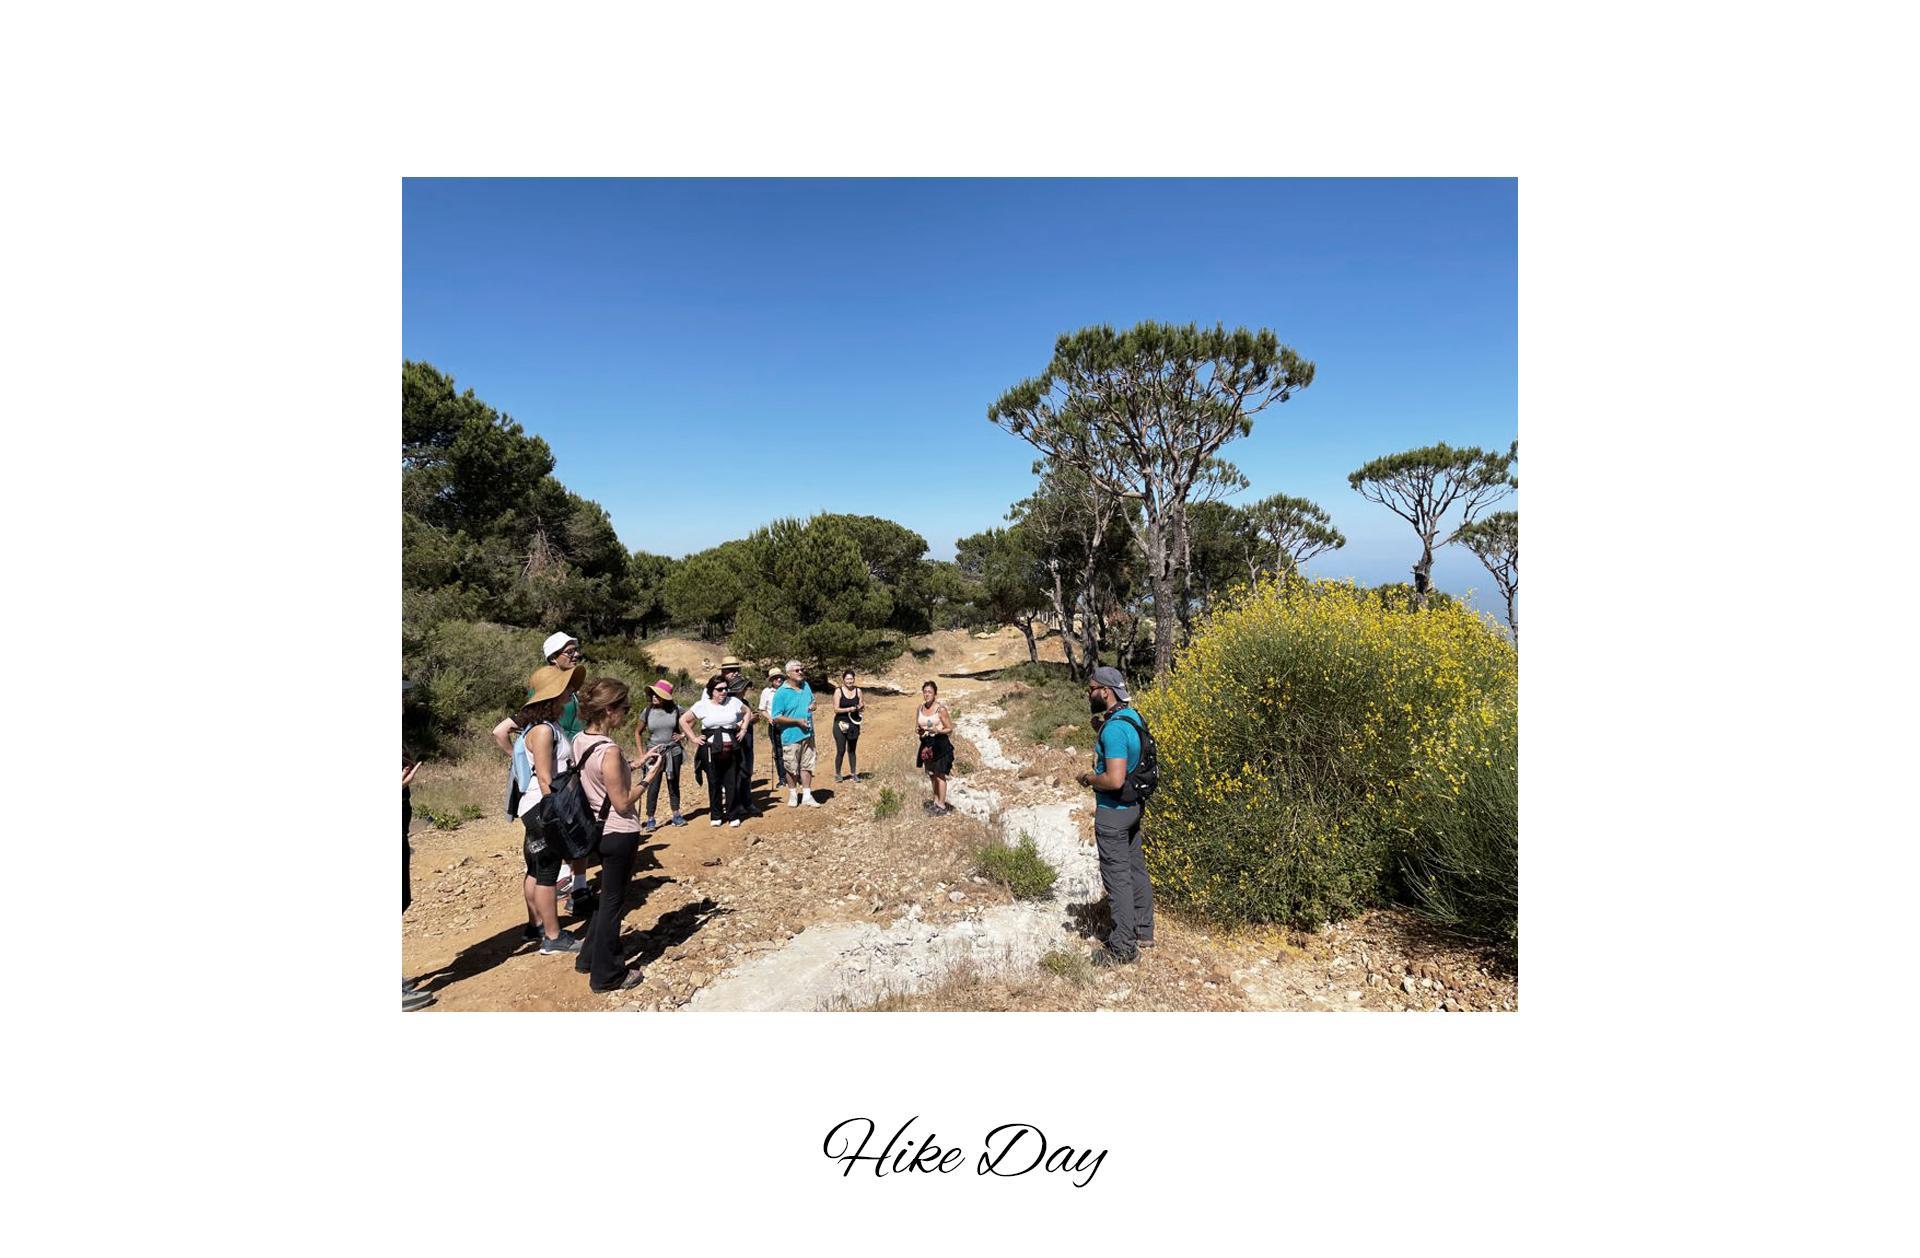 Hike Day